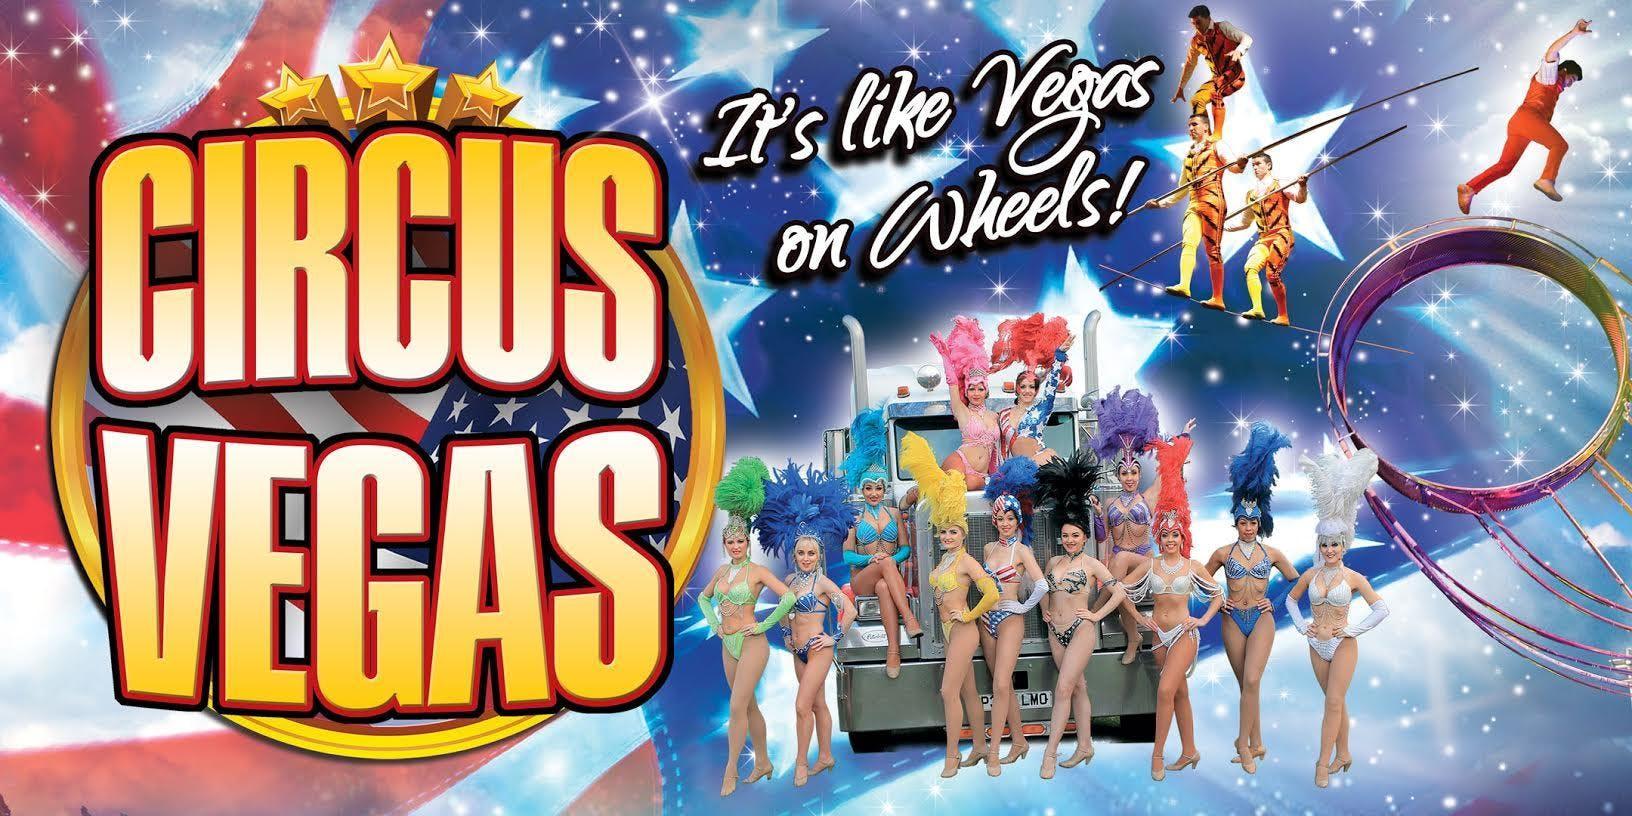 Circus Vegas - Brighton